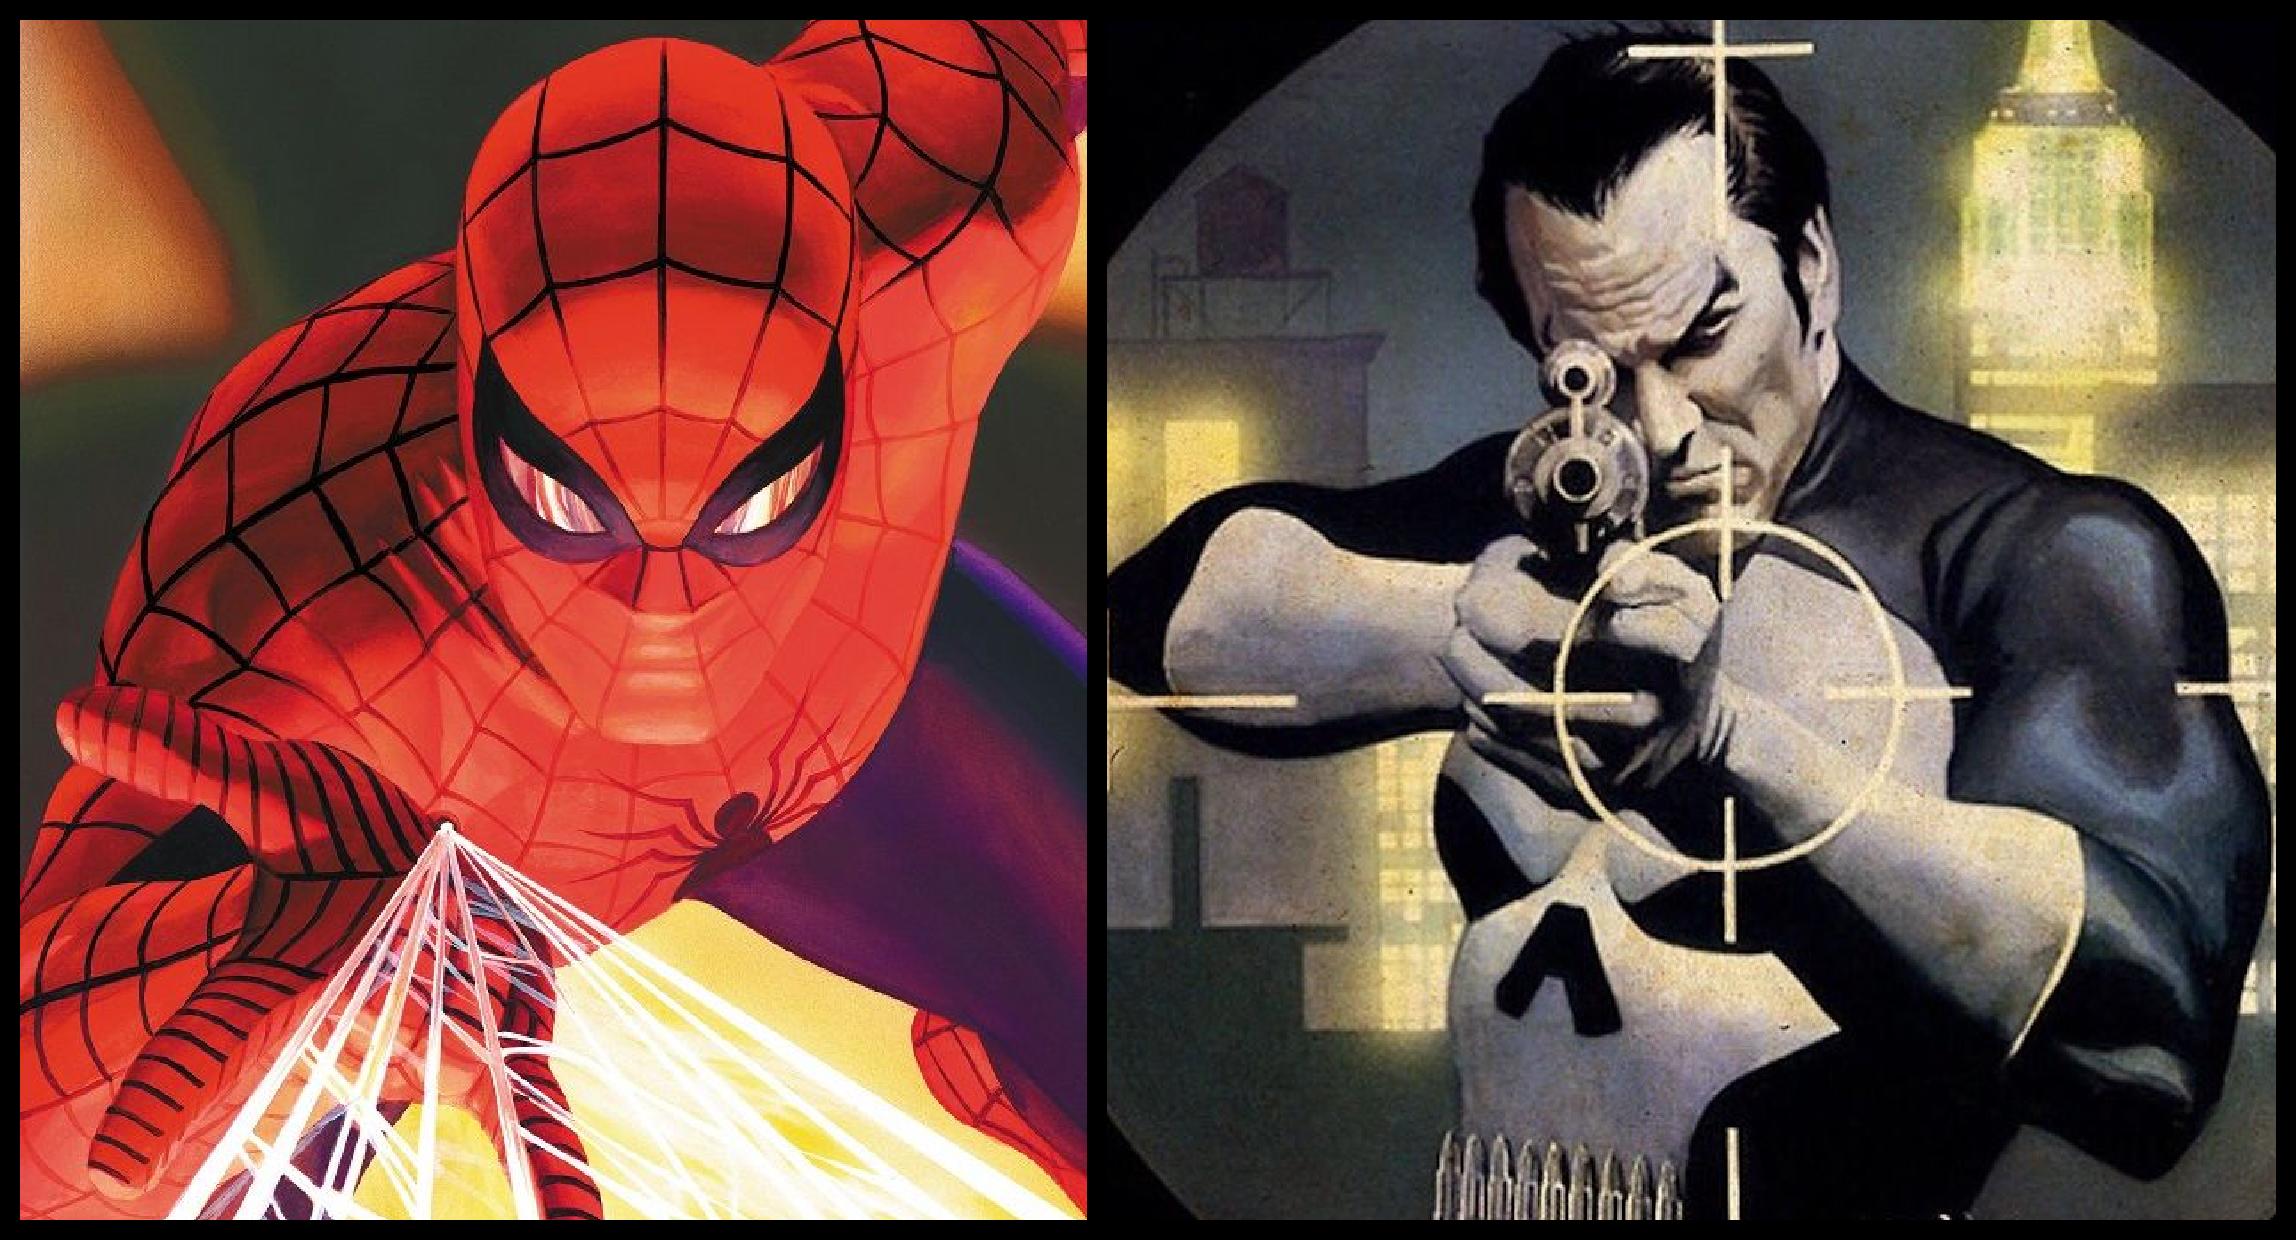 (Alex Ross) SpidermanVsPunisher